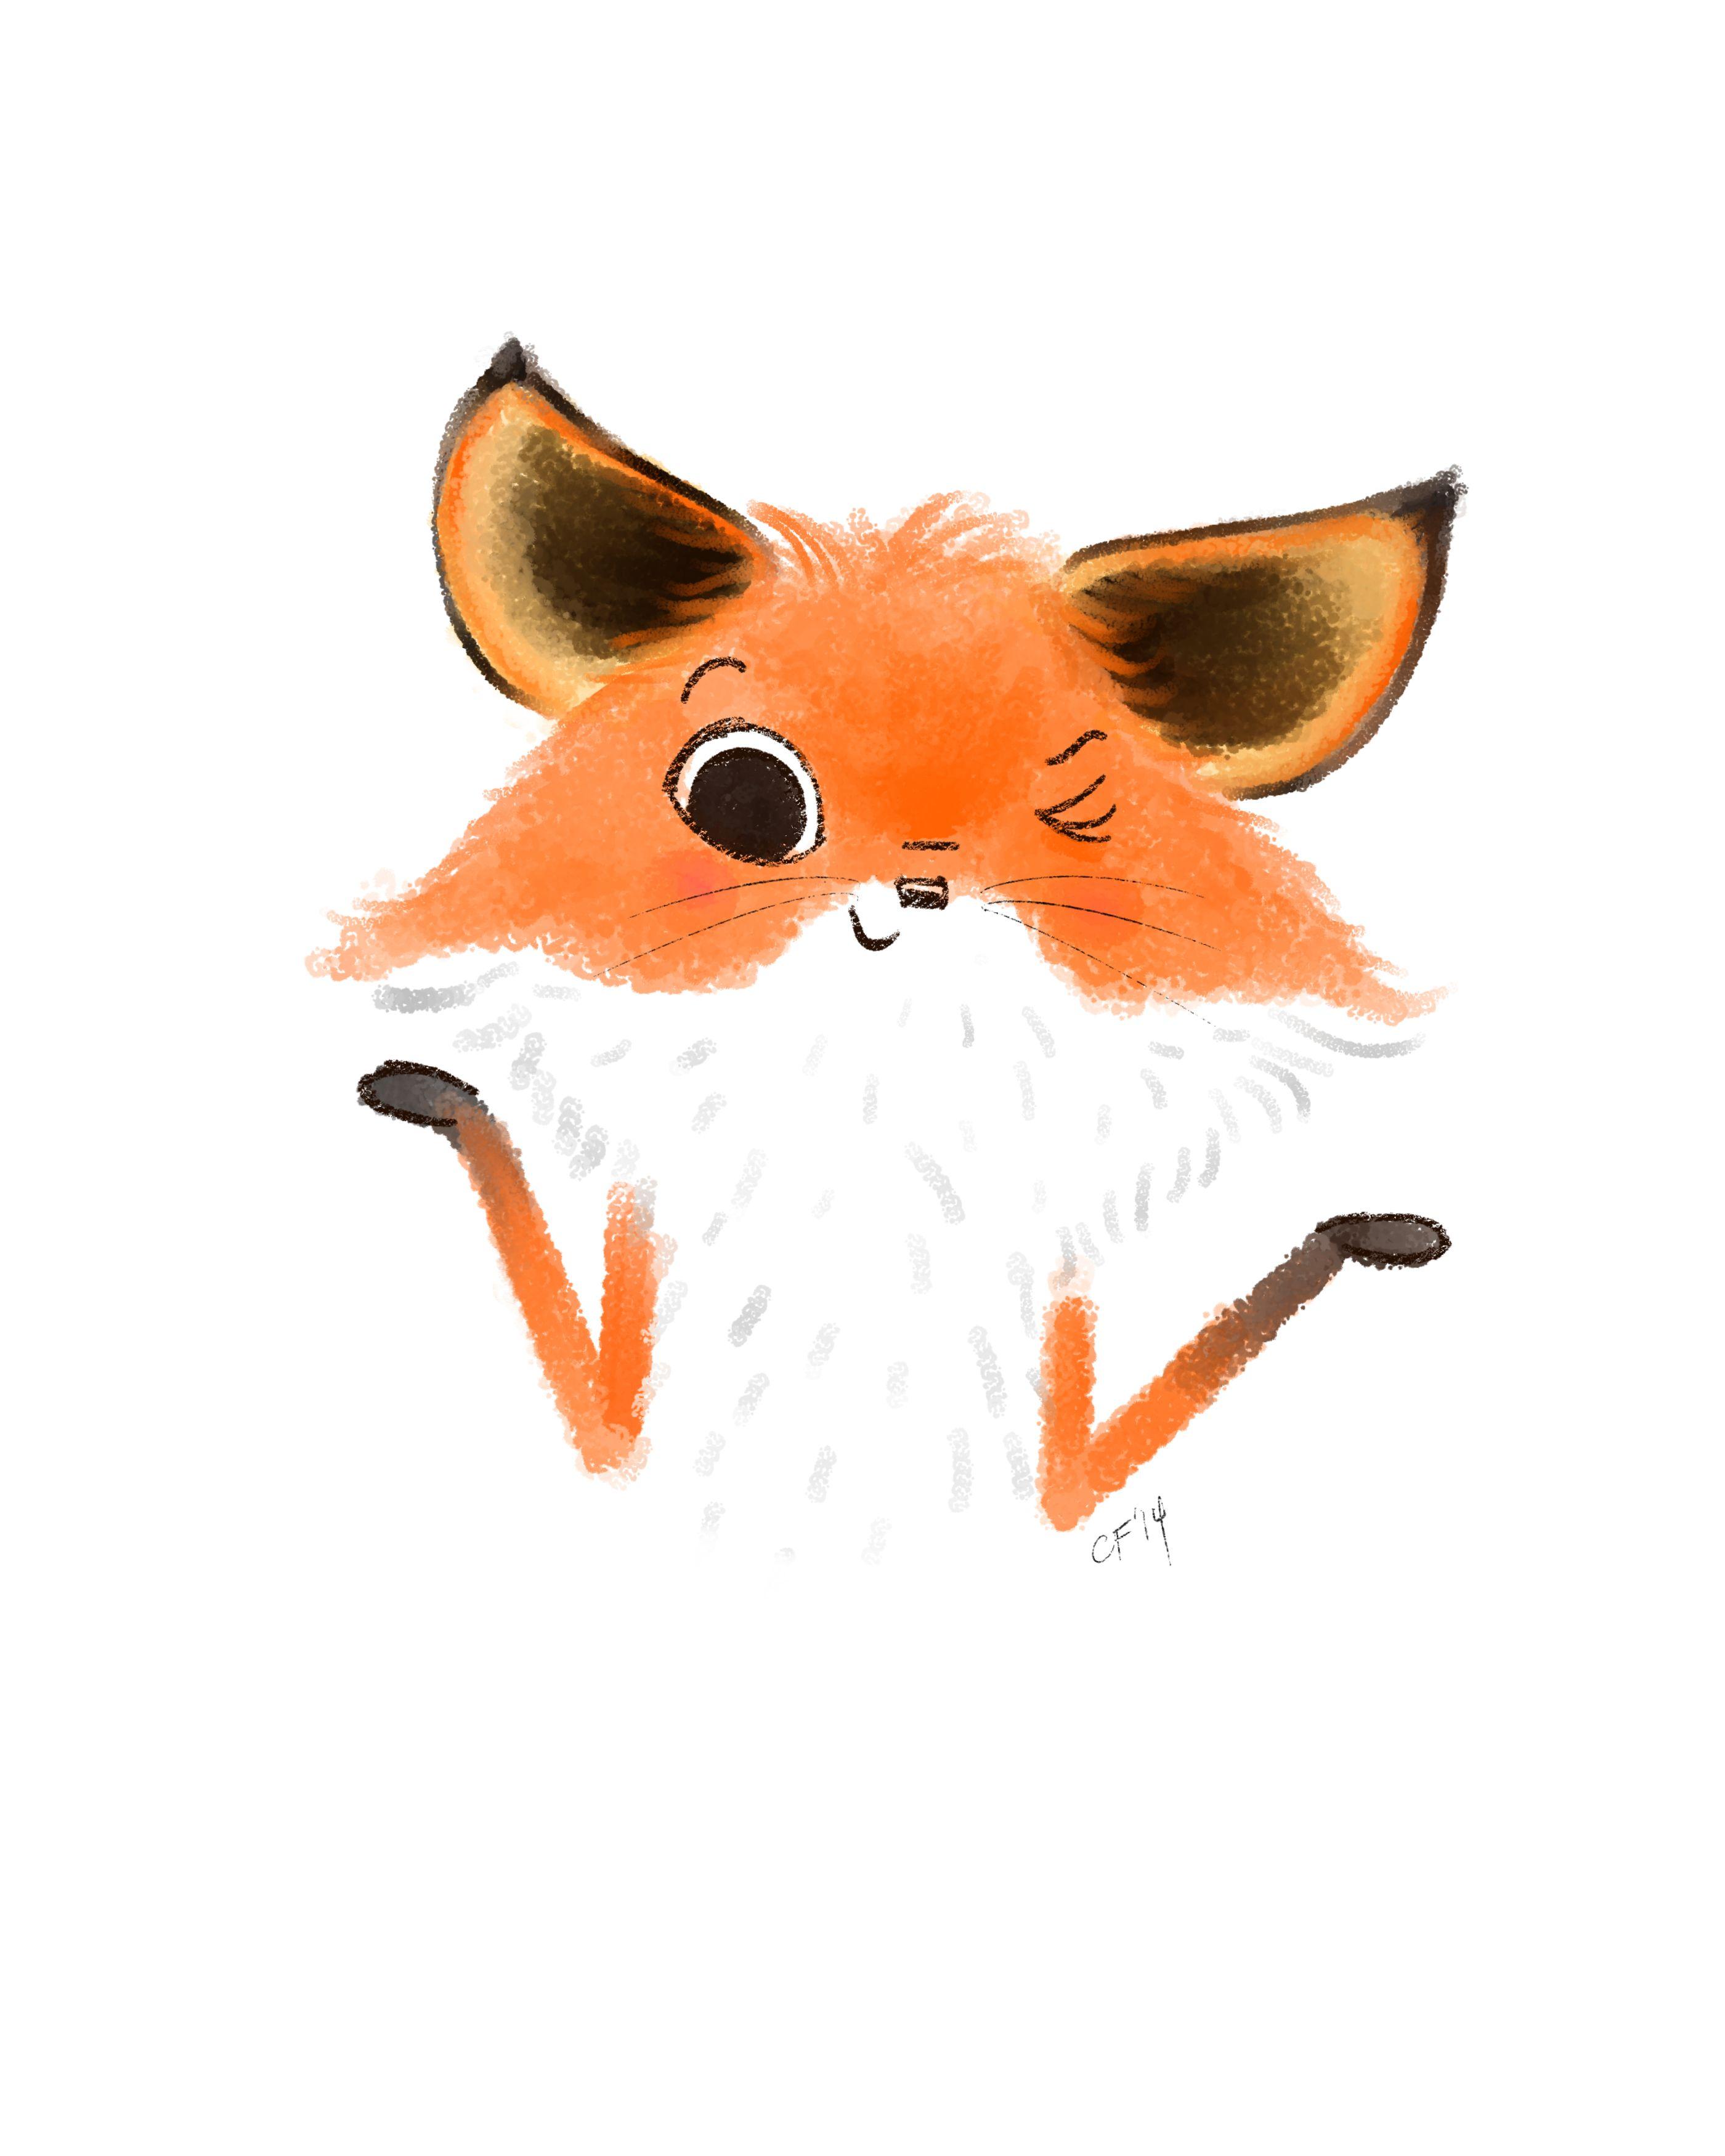 christina forshay illustration sly fox art i love